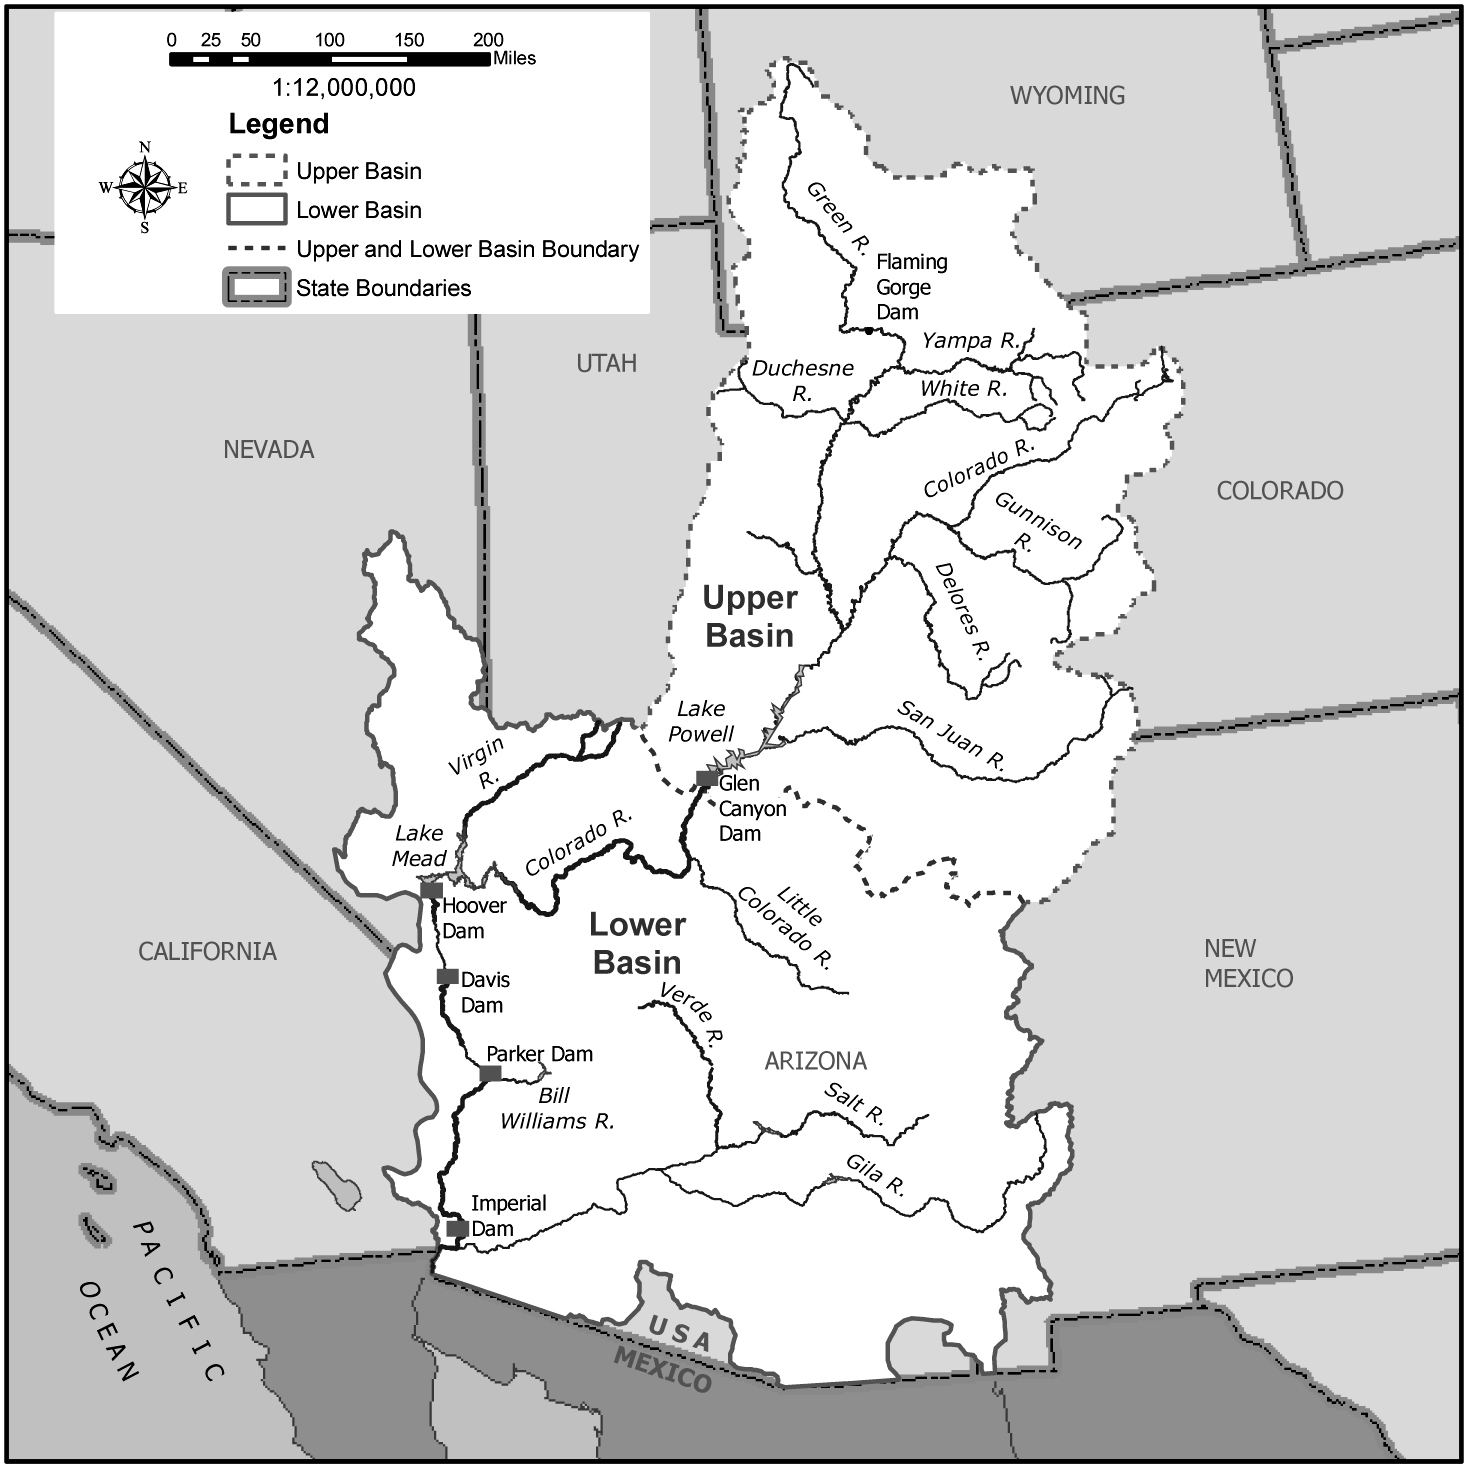 Source: U.S. Department of the Interior, Bureau of Reclamation